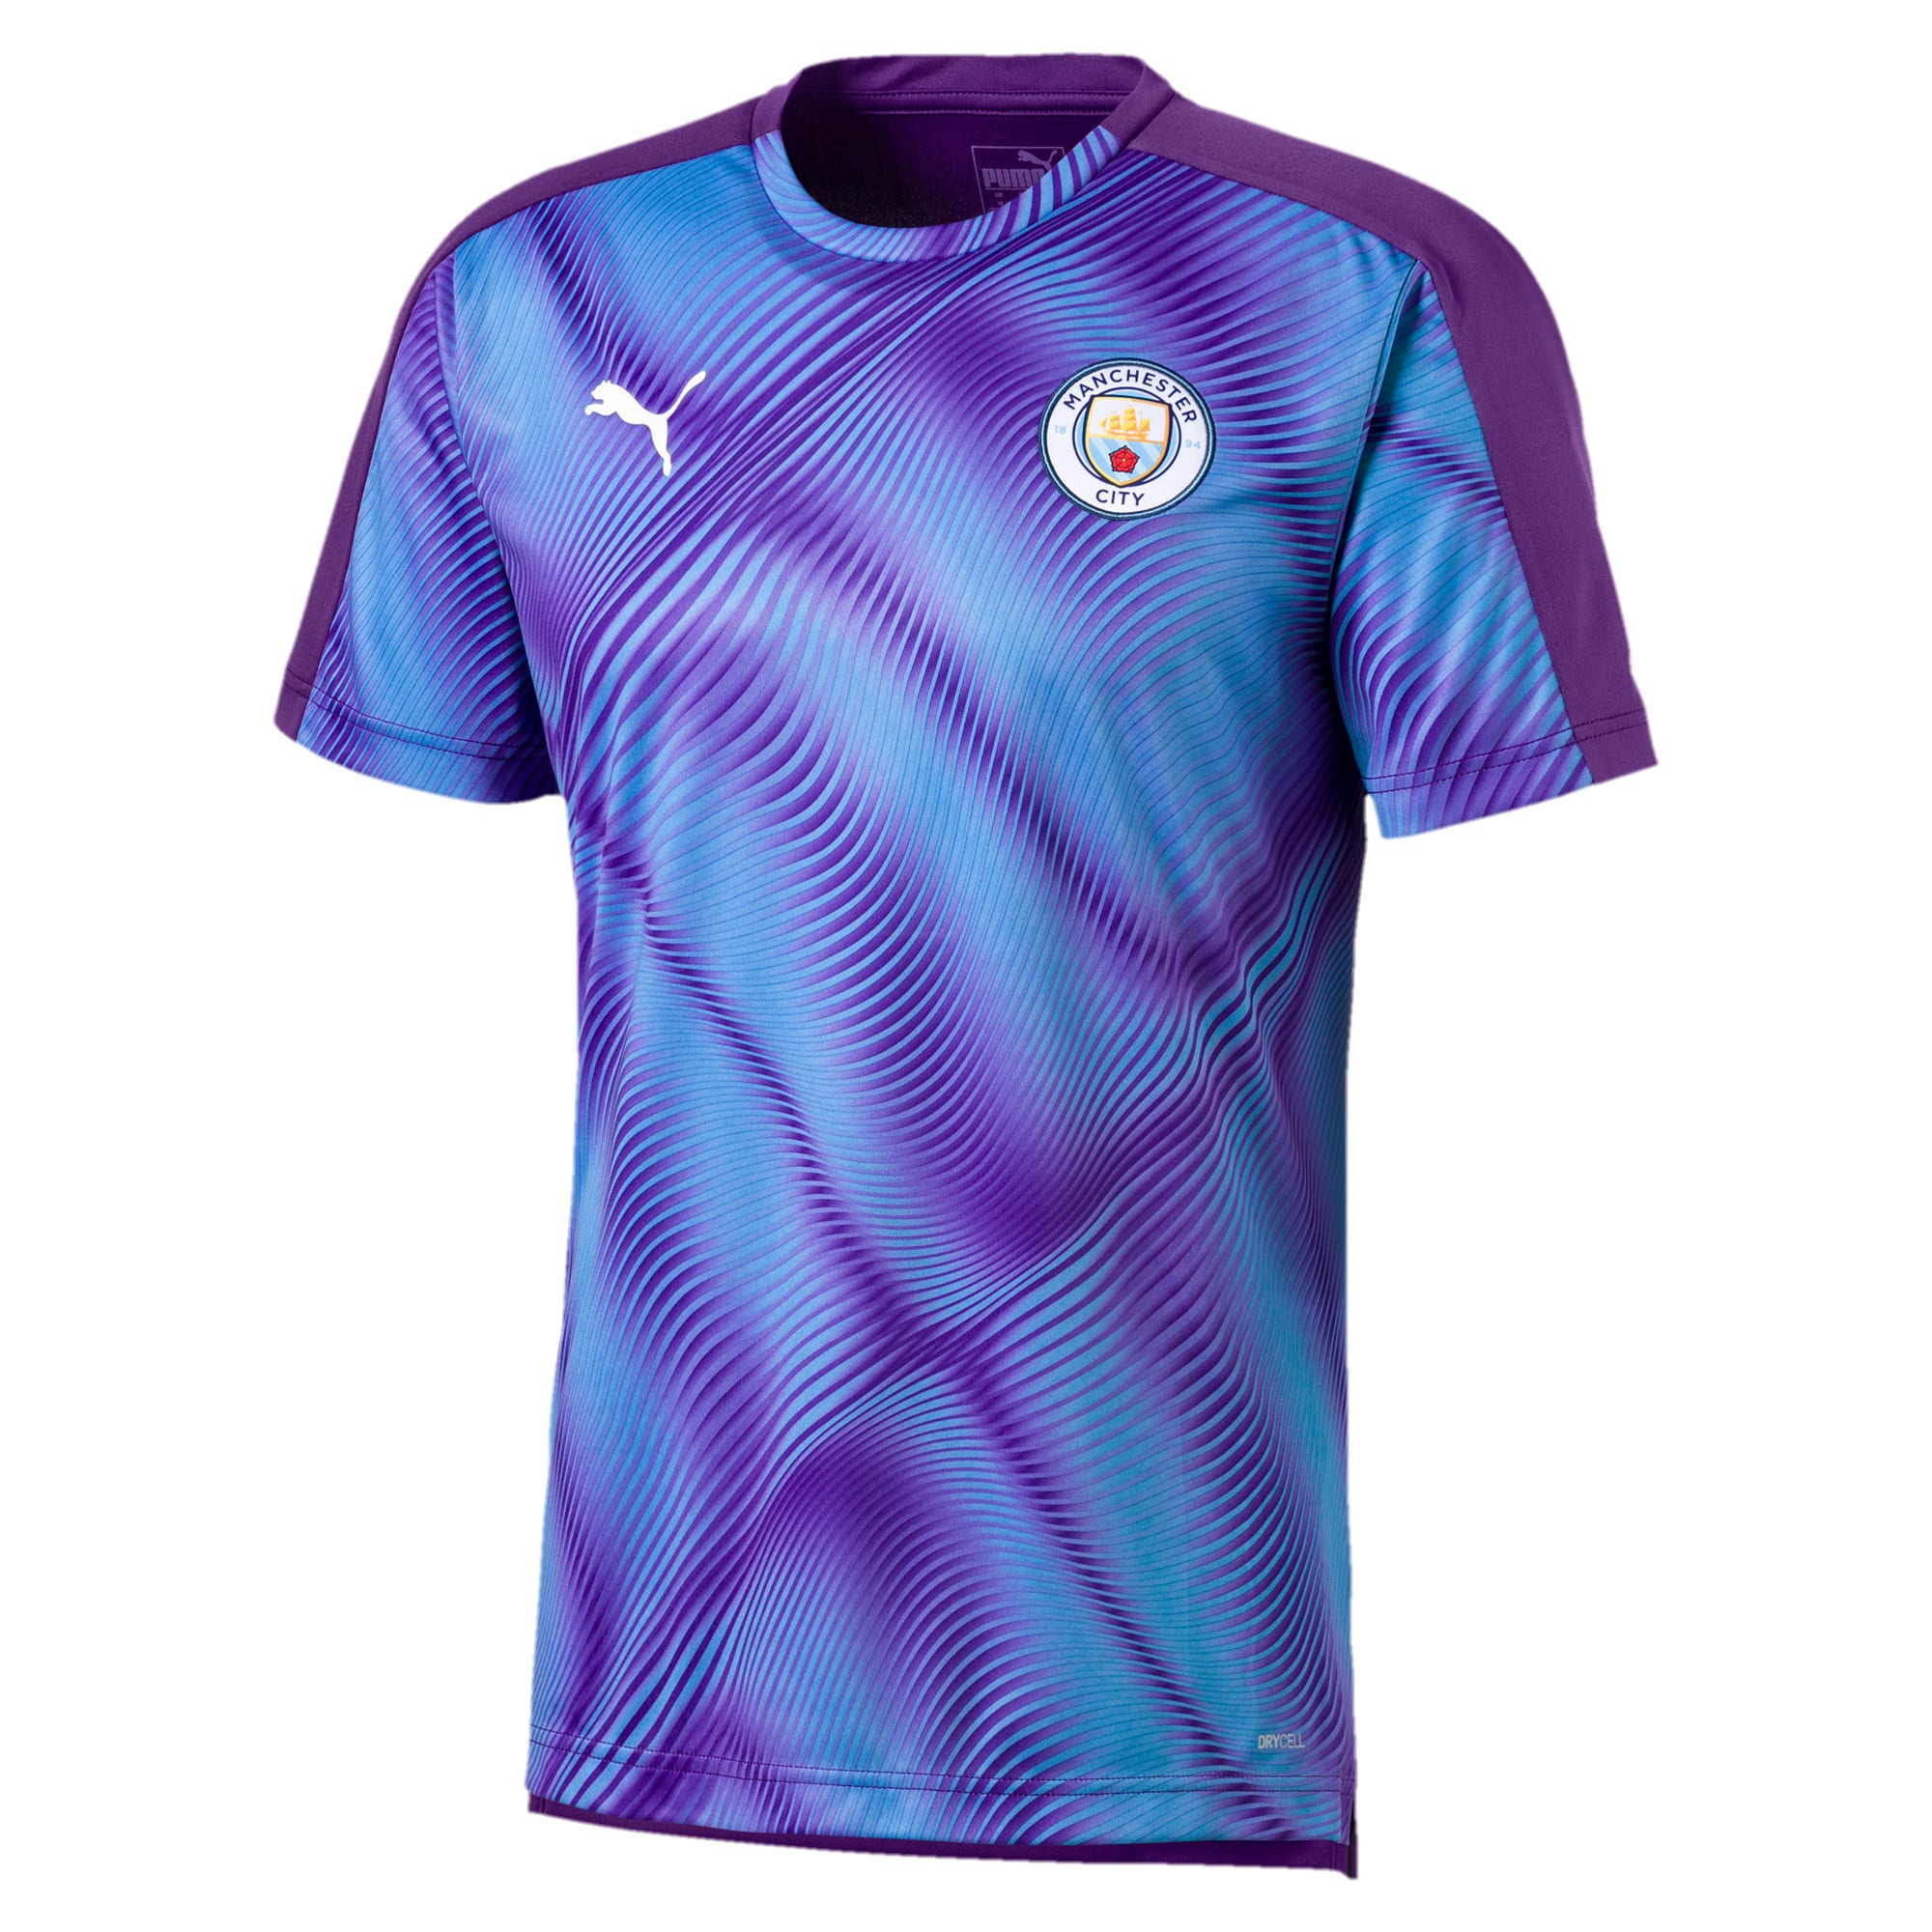 Imagen en miniatura 1 de Camiseta de hombre Stadium League Man City, TillandsiaPurple-TeamLightBl, mediana